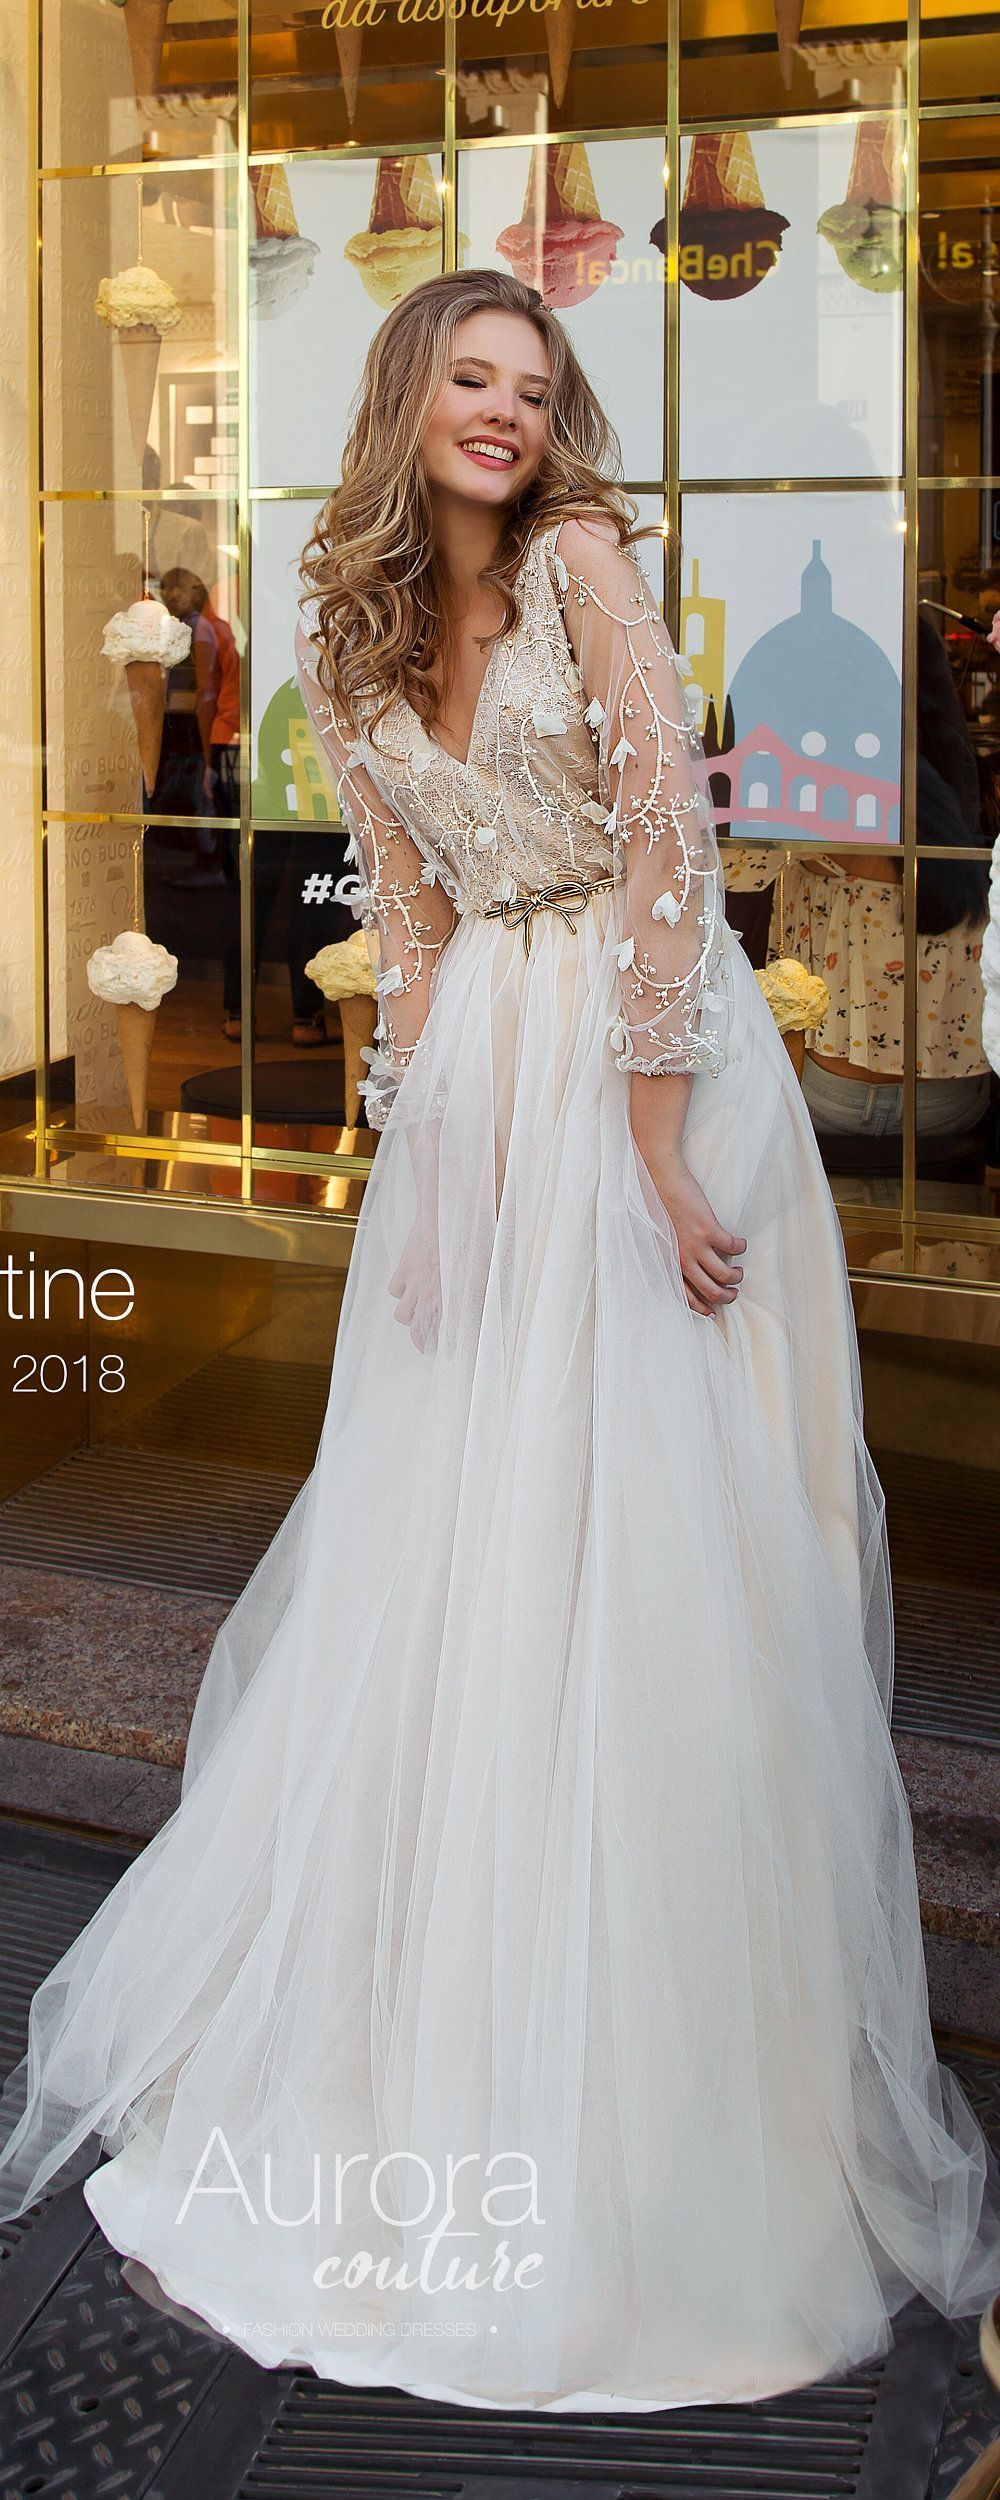 Wedding decorations at the beach january 2019 Bohemian wedding dress wedding dress long sleeve wedding dress